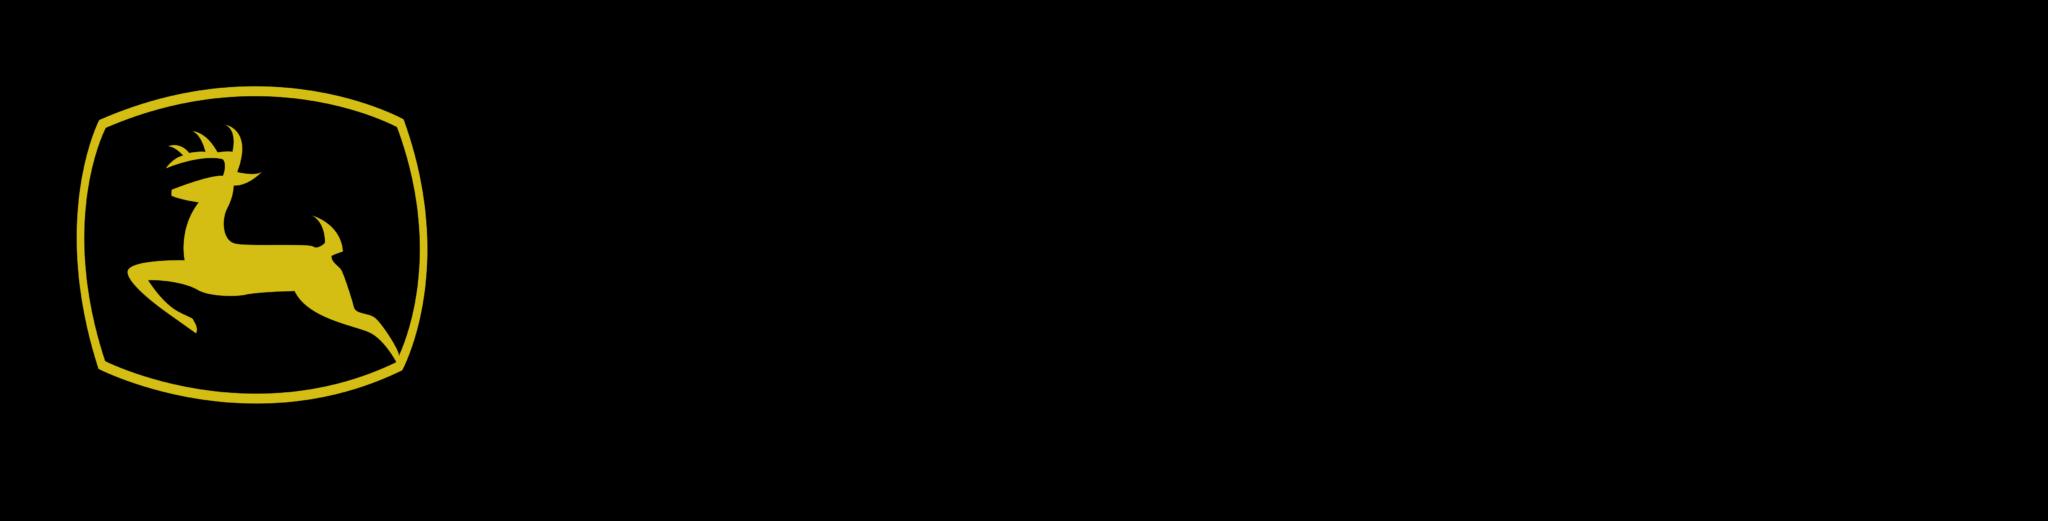 John Deere gENERATOR AND gENSET